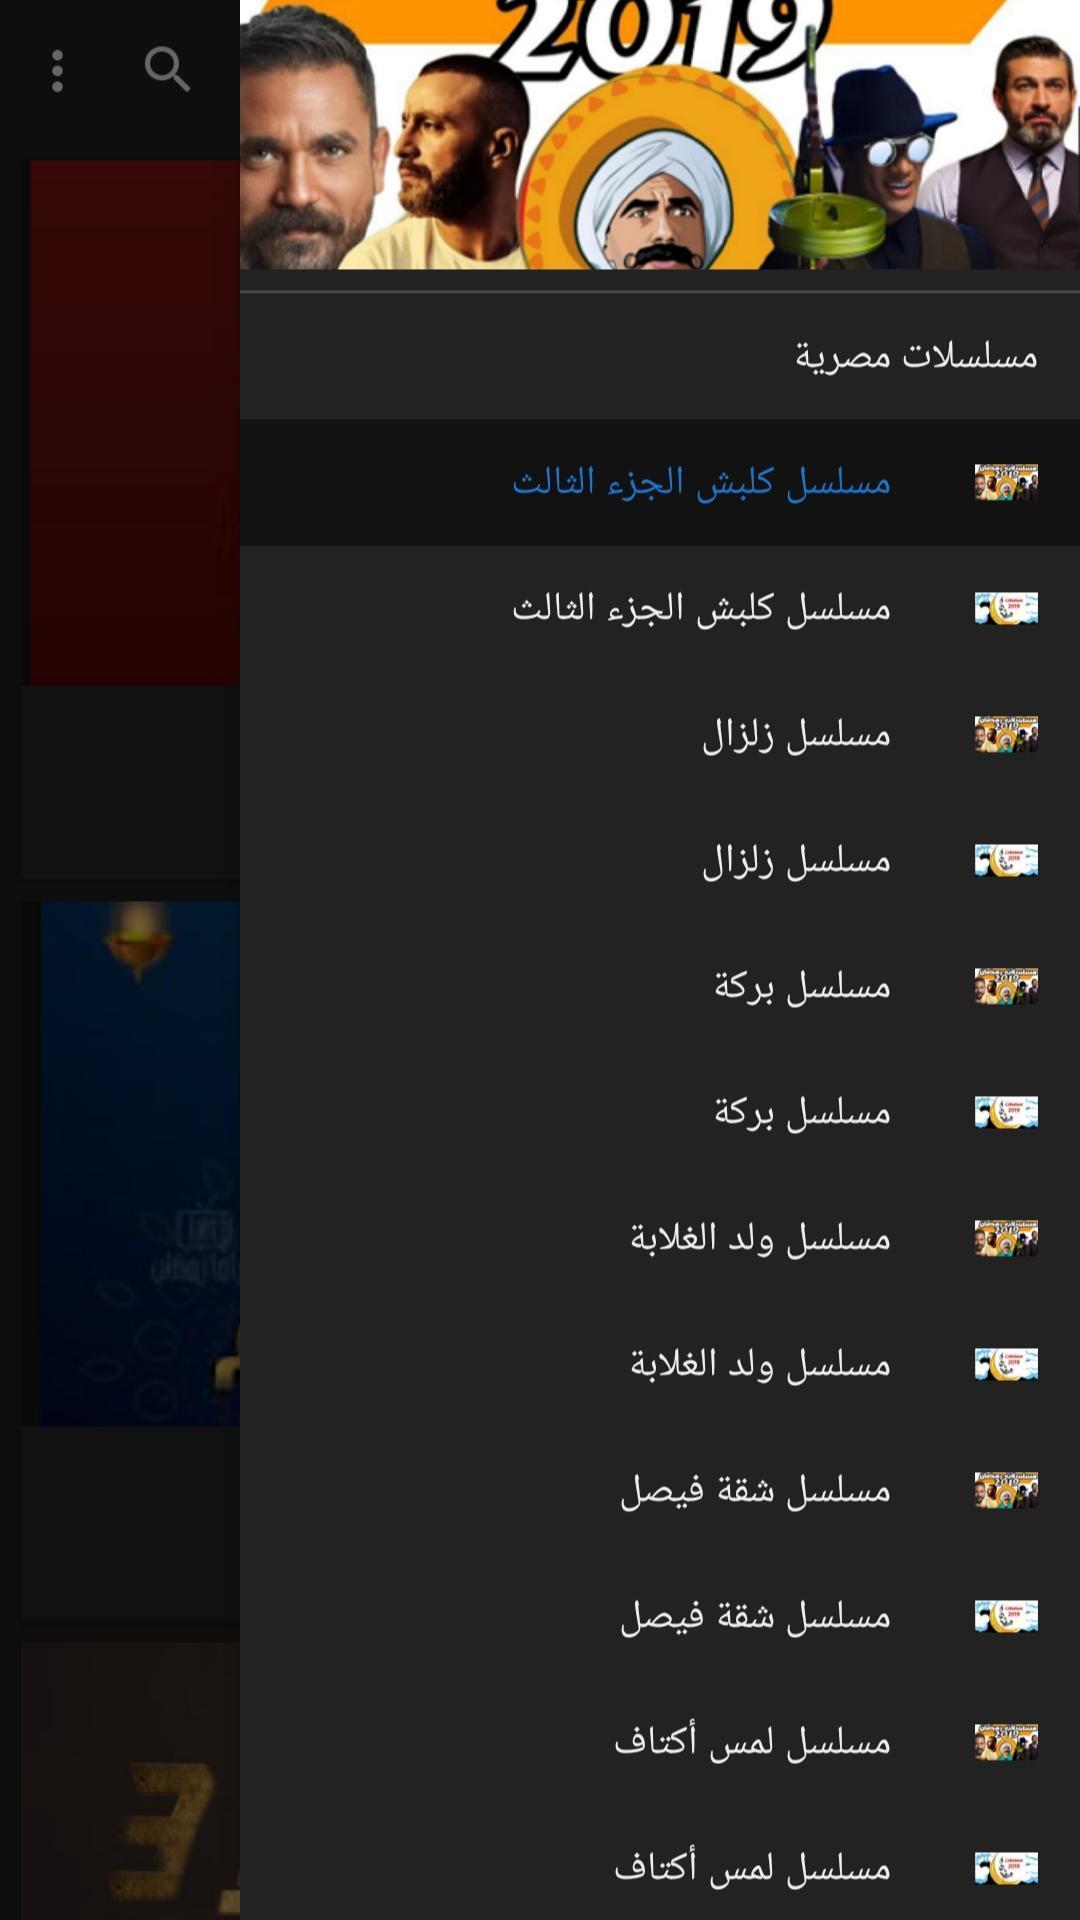 تحميل تطبيق مسلسلات رمضان 13